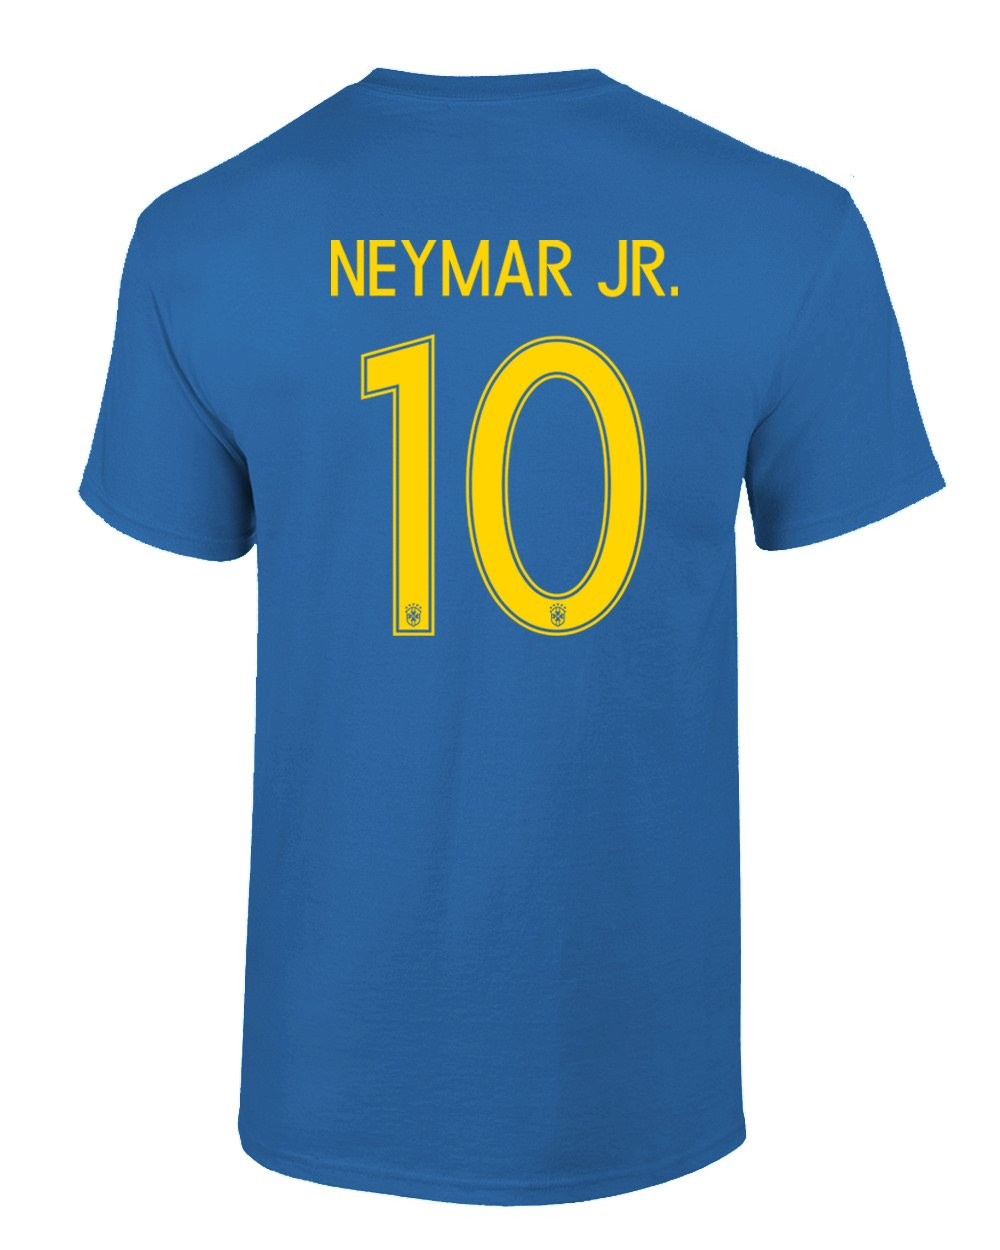 bfe5615512a Amazon.com: Tcamp Brazil 2018 National Soccer #10 NEYMAR JR. World  Championship Men's T-Shirt: Sports & Outdoors